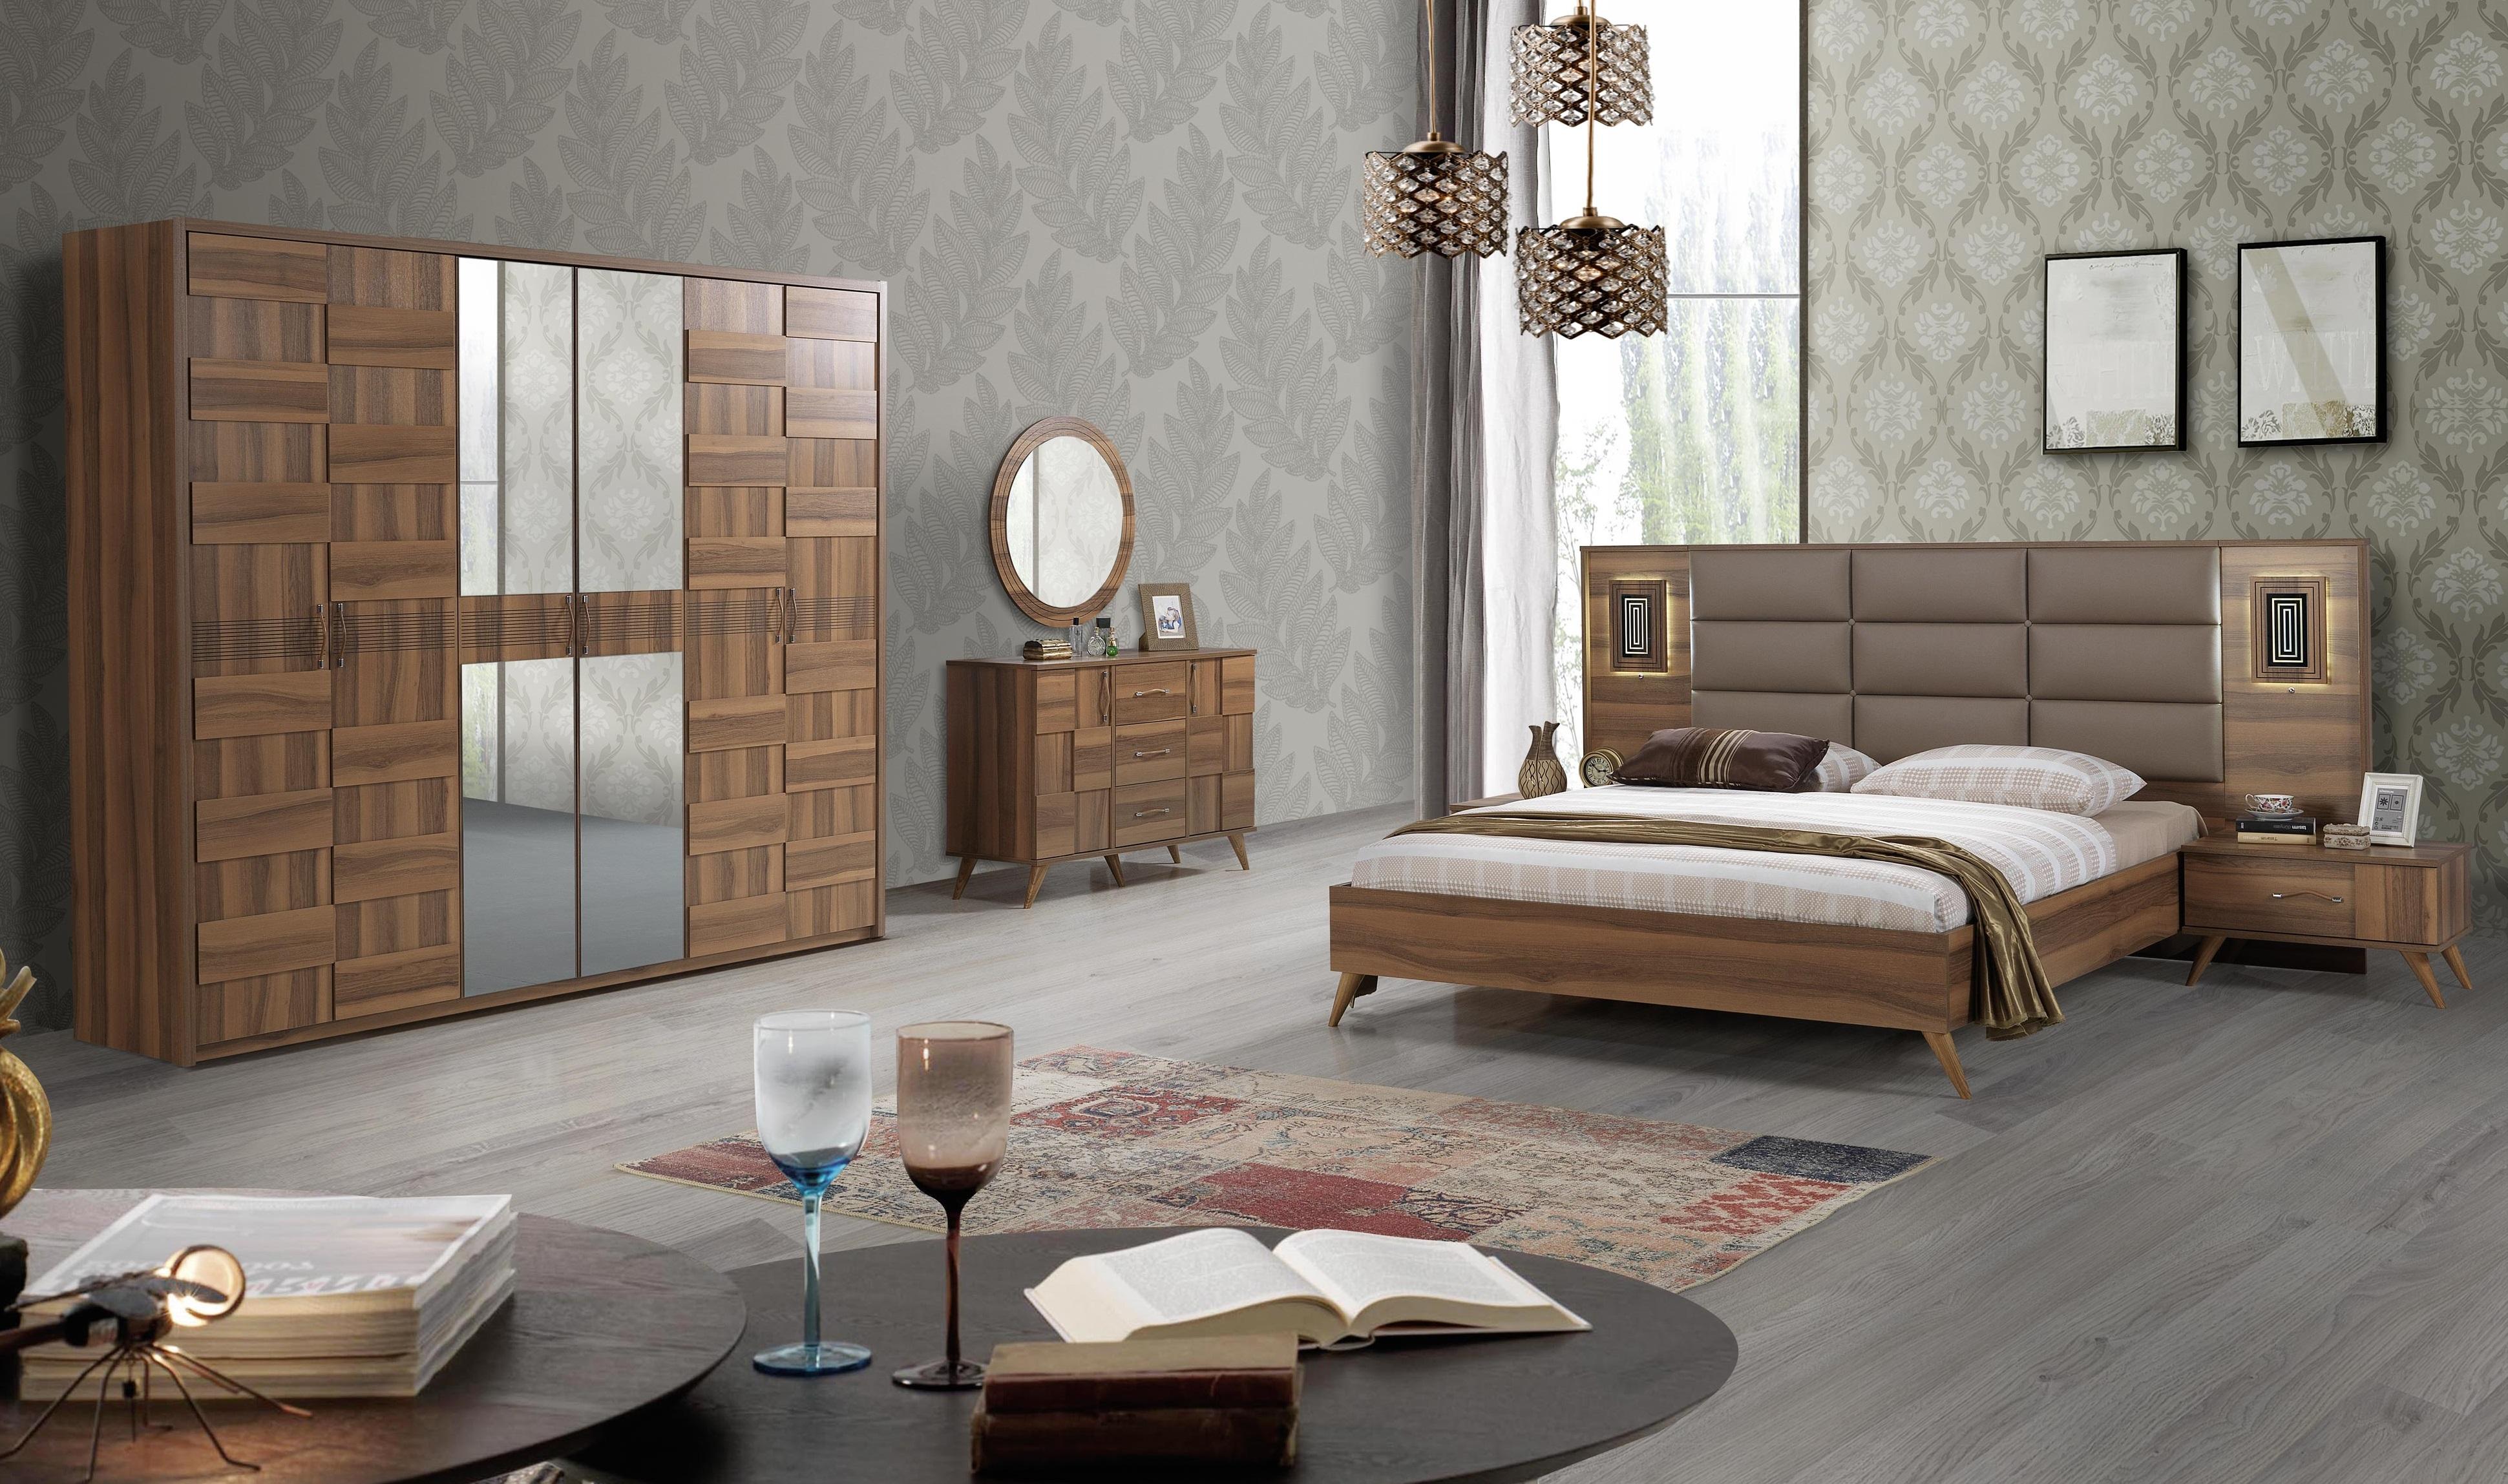 lotus schlafzimmer yuvam m belhaus in wuppertal cilek offizieller h ndler in europa. Black Bedroom Furniture Sets. Home Design Ideas